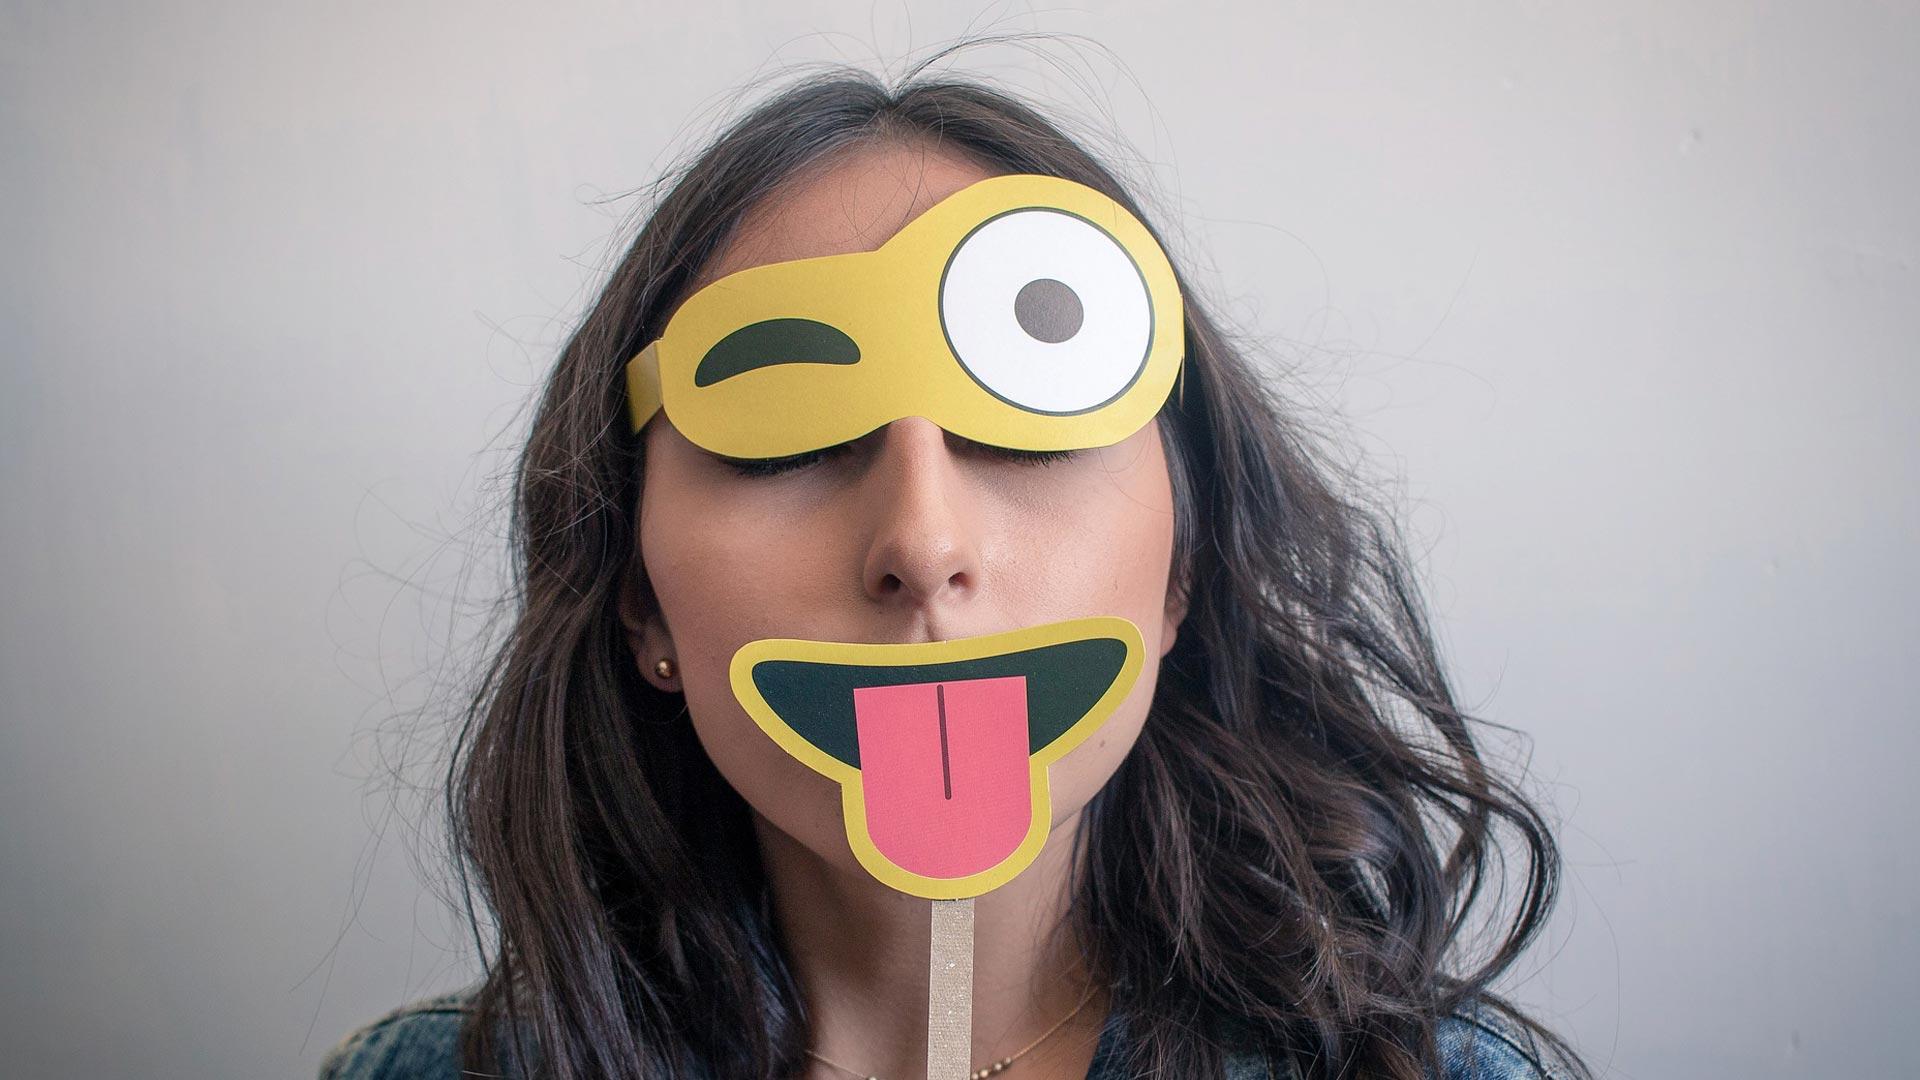 emoji-real-girl-smile